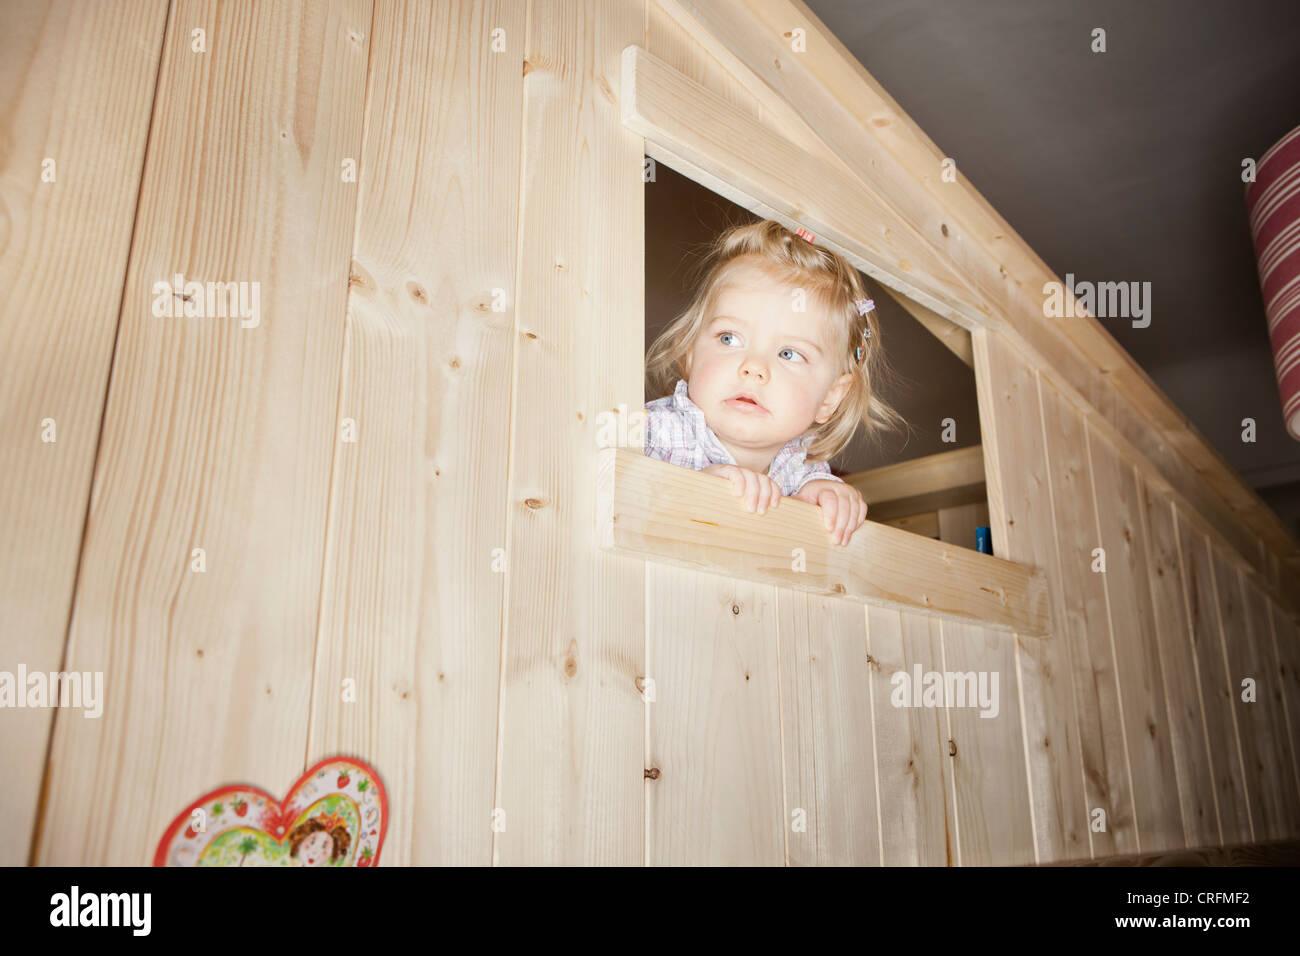 Girl peeking out window of playhouse - Stock Image